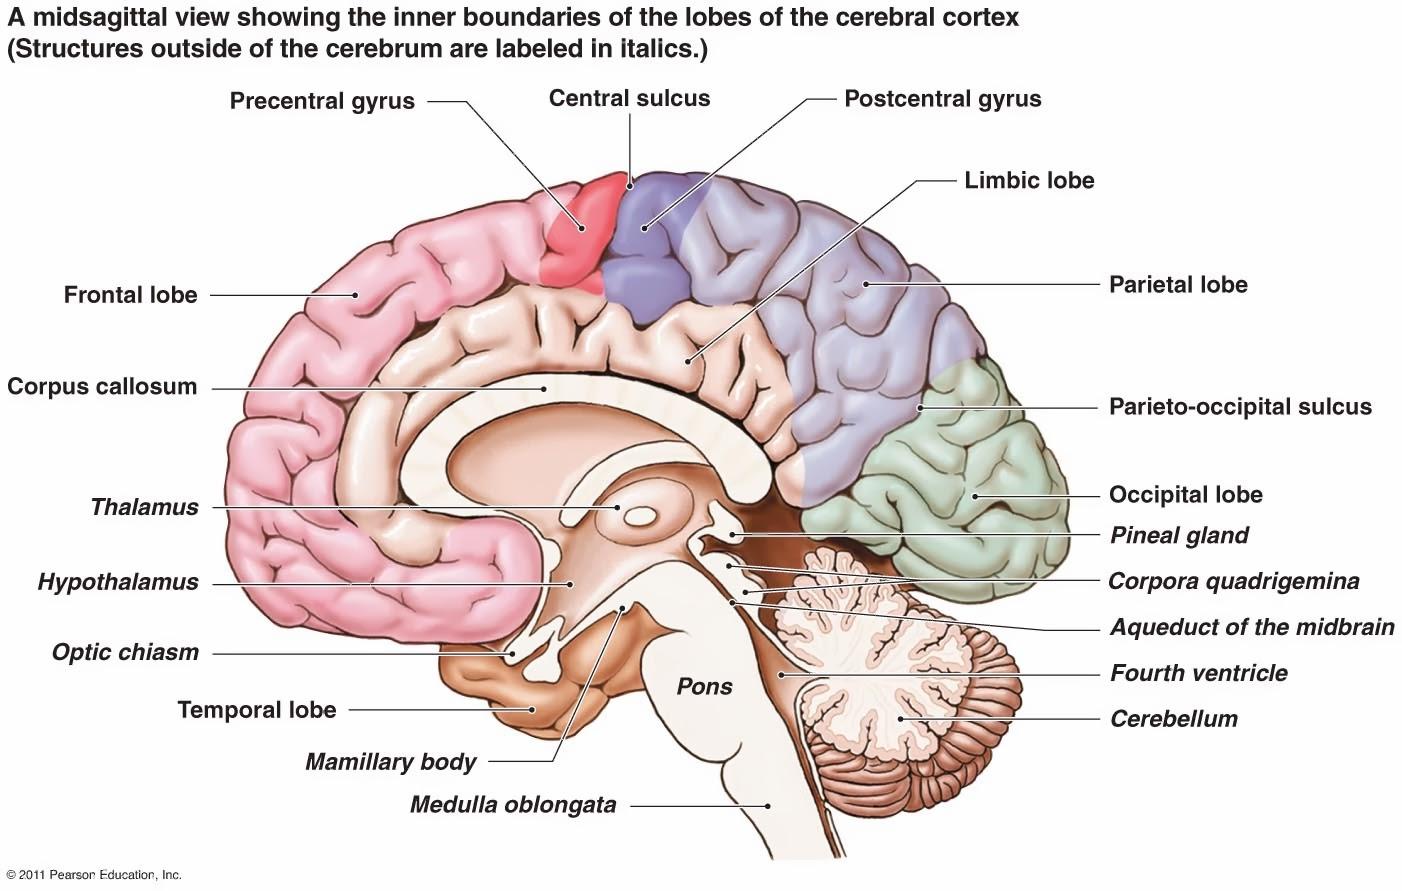 Brain Anatomy Diagram Reticular Formation - House Wiring Diagram ...